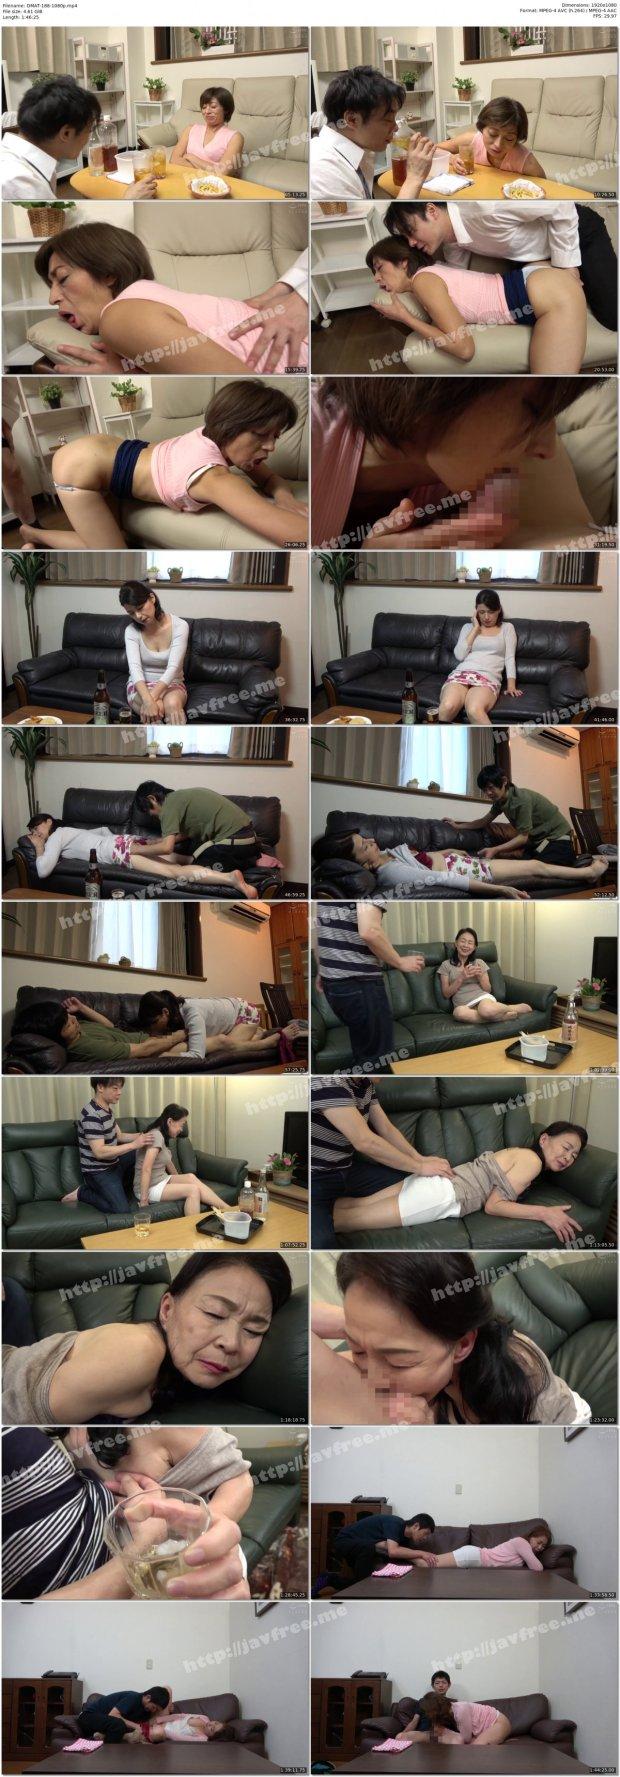 [HD][DMAT-188] 母を酔わせて猥褻マッサージ 異常な息子の主姦映像